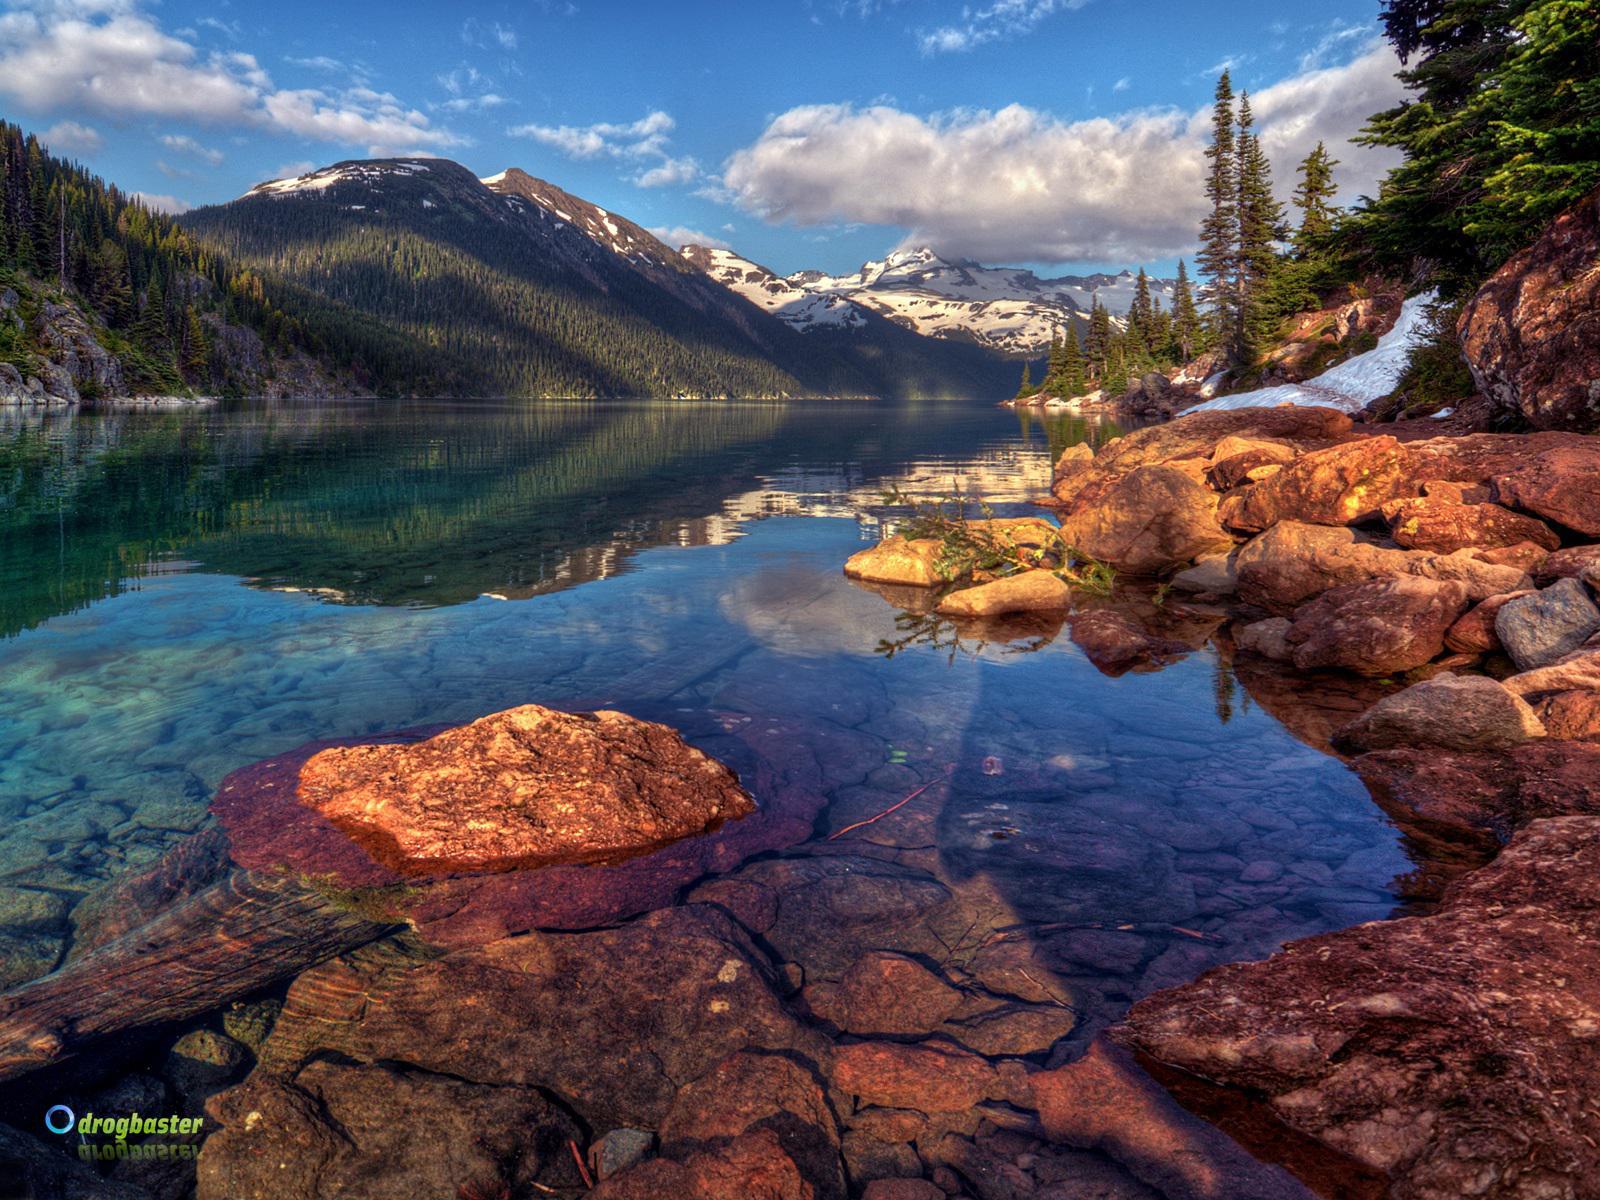 Paesaggi parchi e panorami delle natura for Foto paesaggi gratis